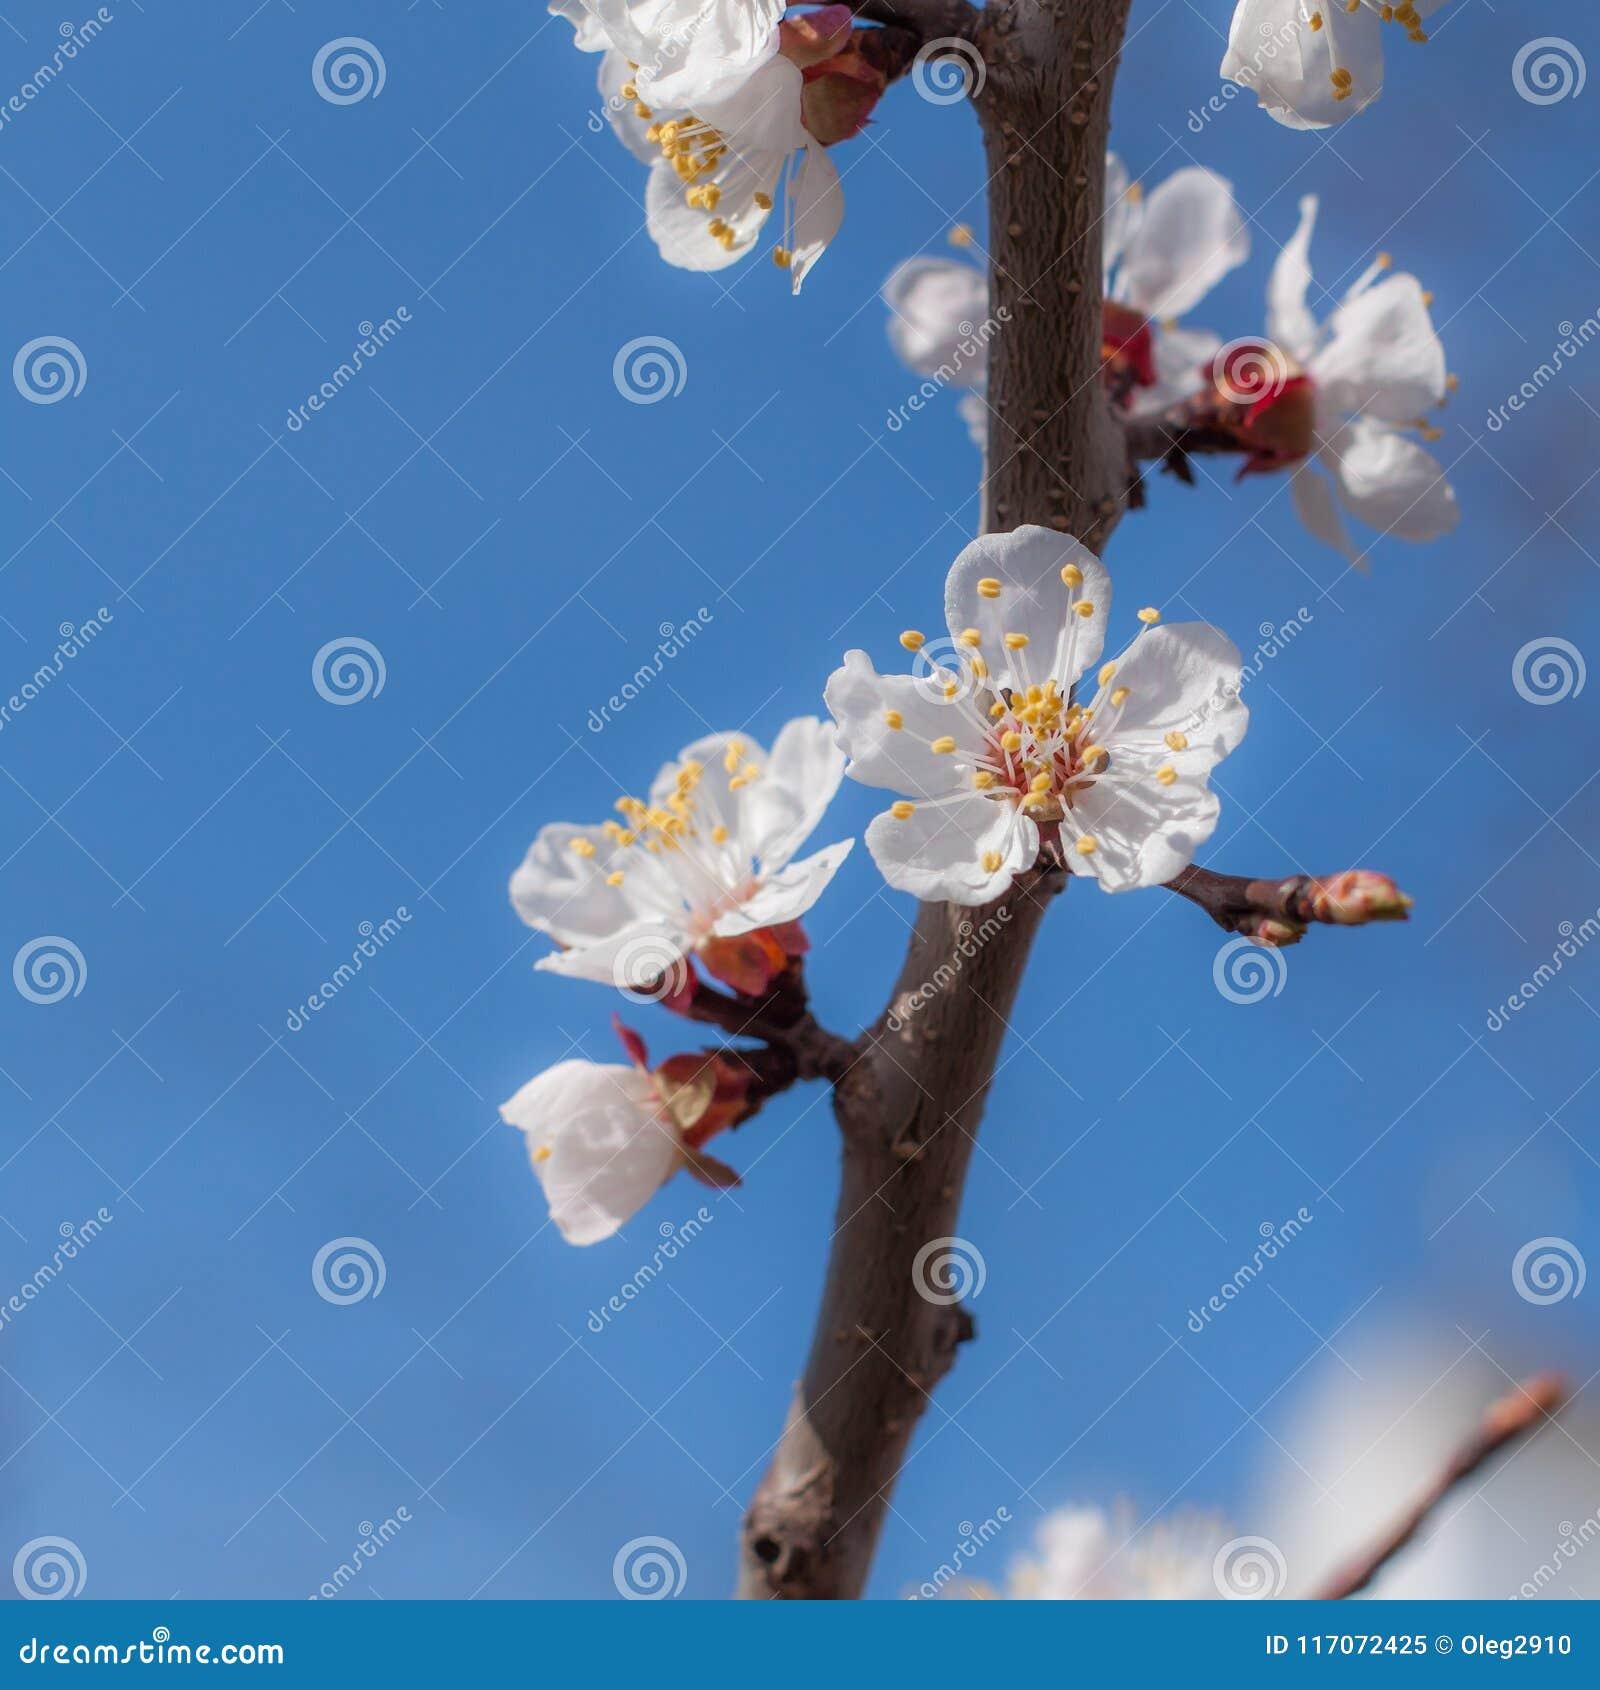 Spring flowering trees on the blue sky stock image image of blue spring flowering trees on the blue sky izmirmasajfo